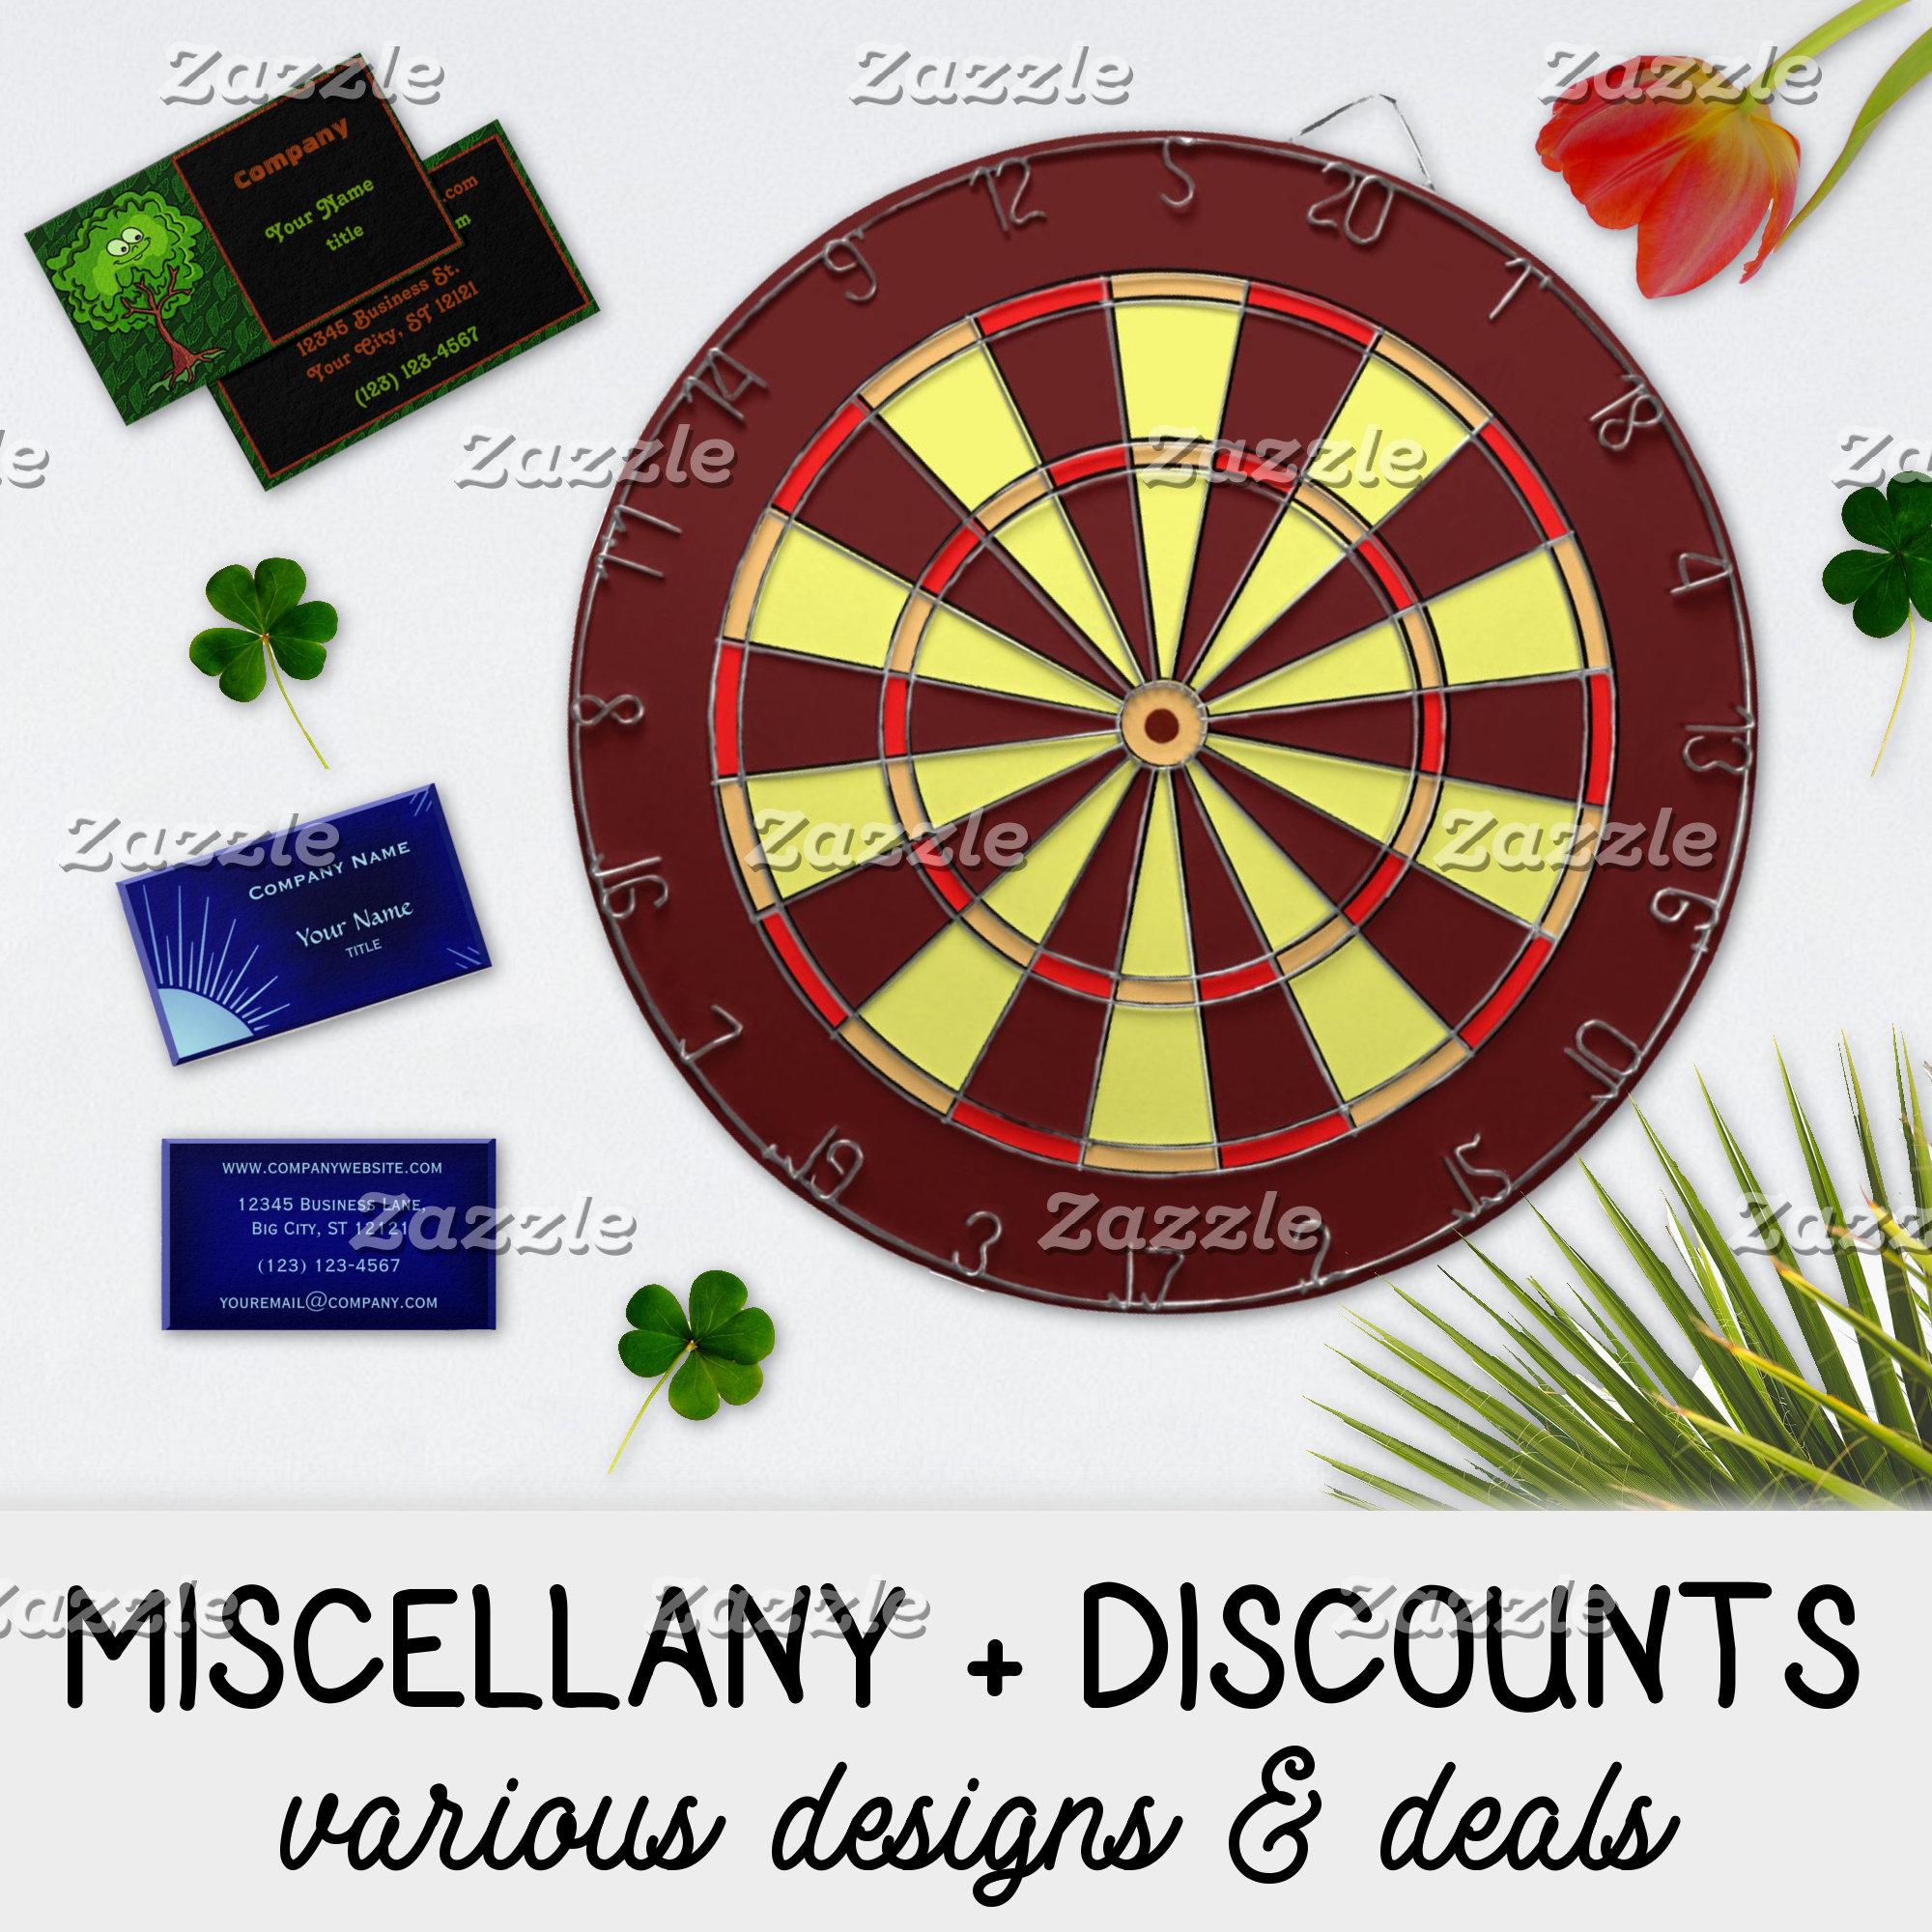 MISCELLANY & DISCOUNTS